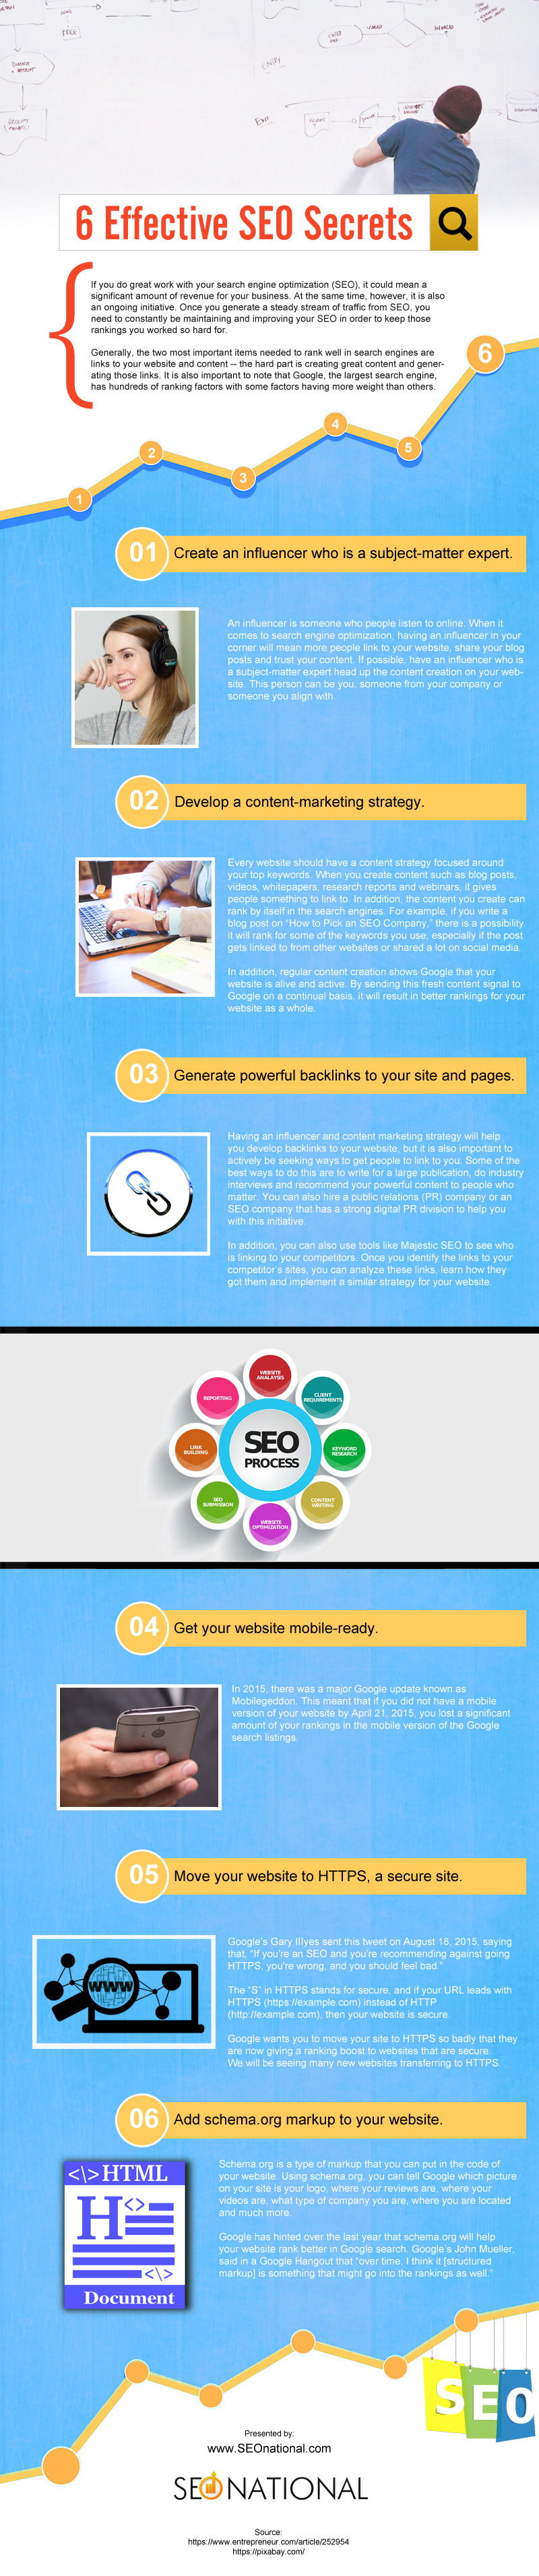 6 Effective SEO Secrets [infographic]